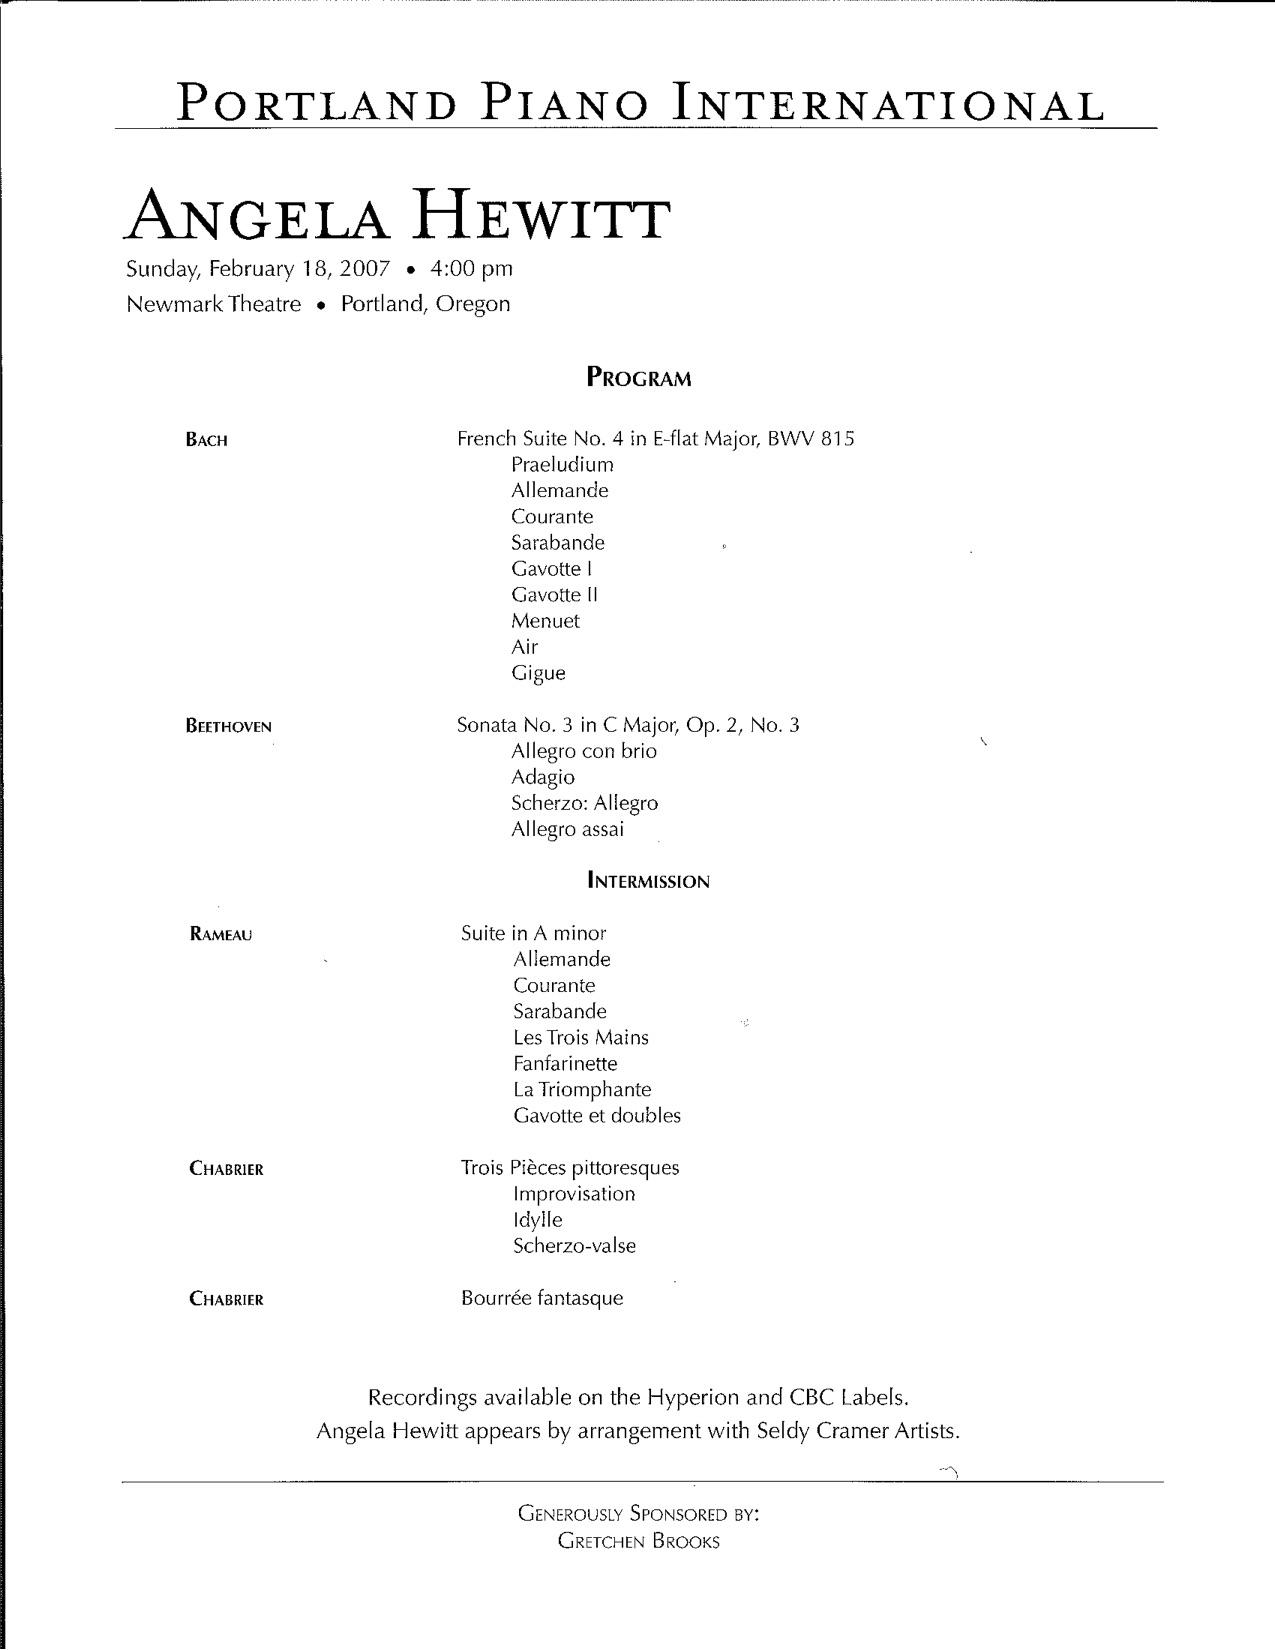 Hewitt06-07_Program2.jpg